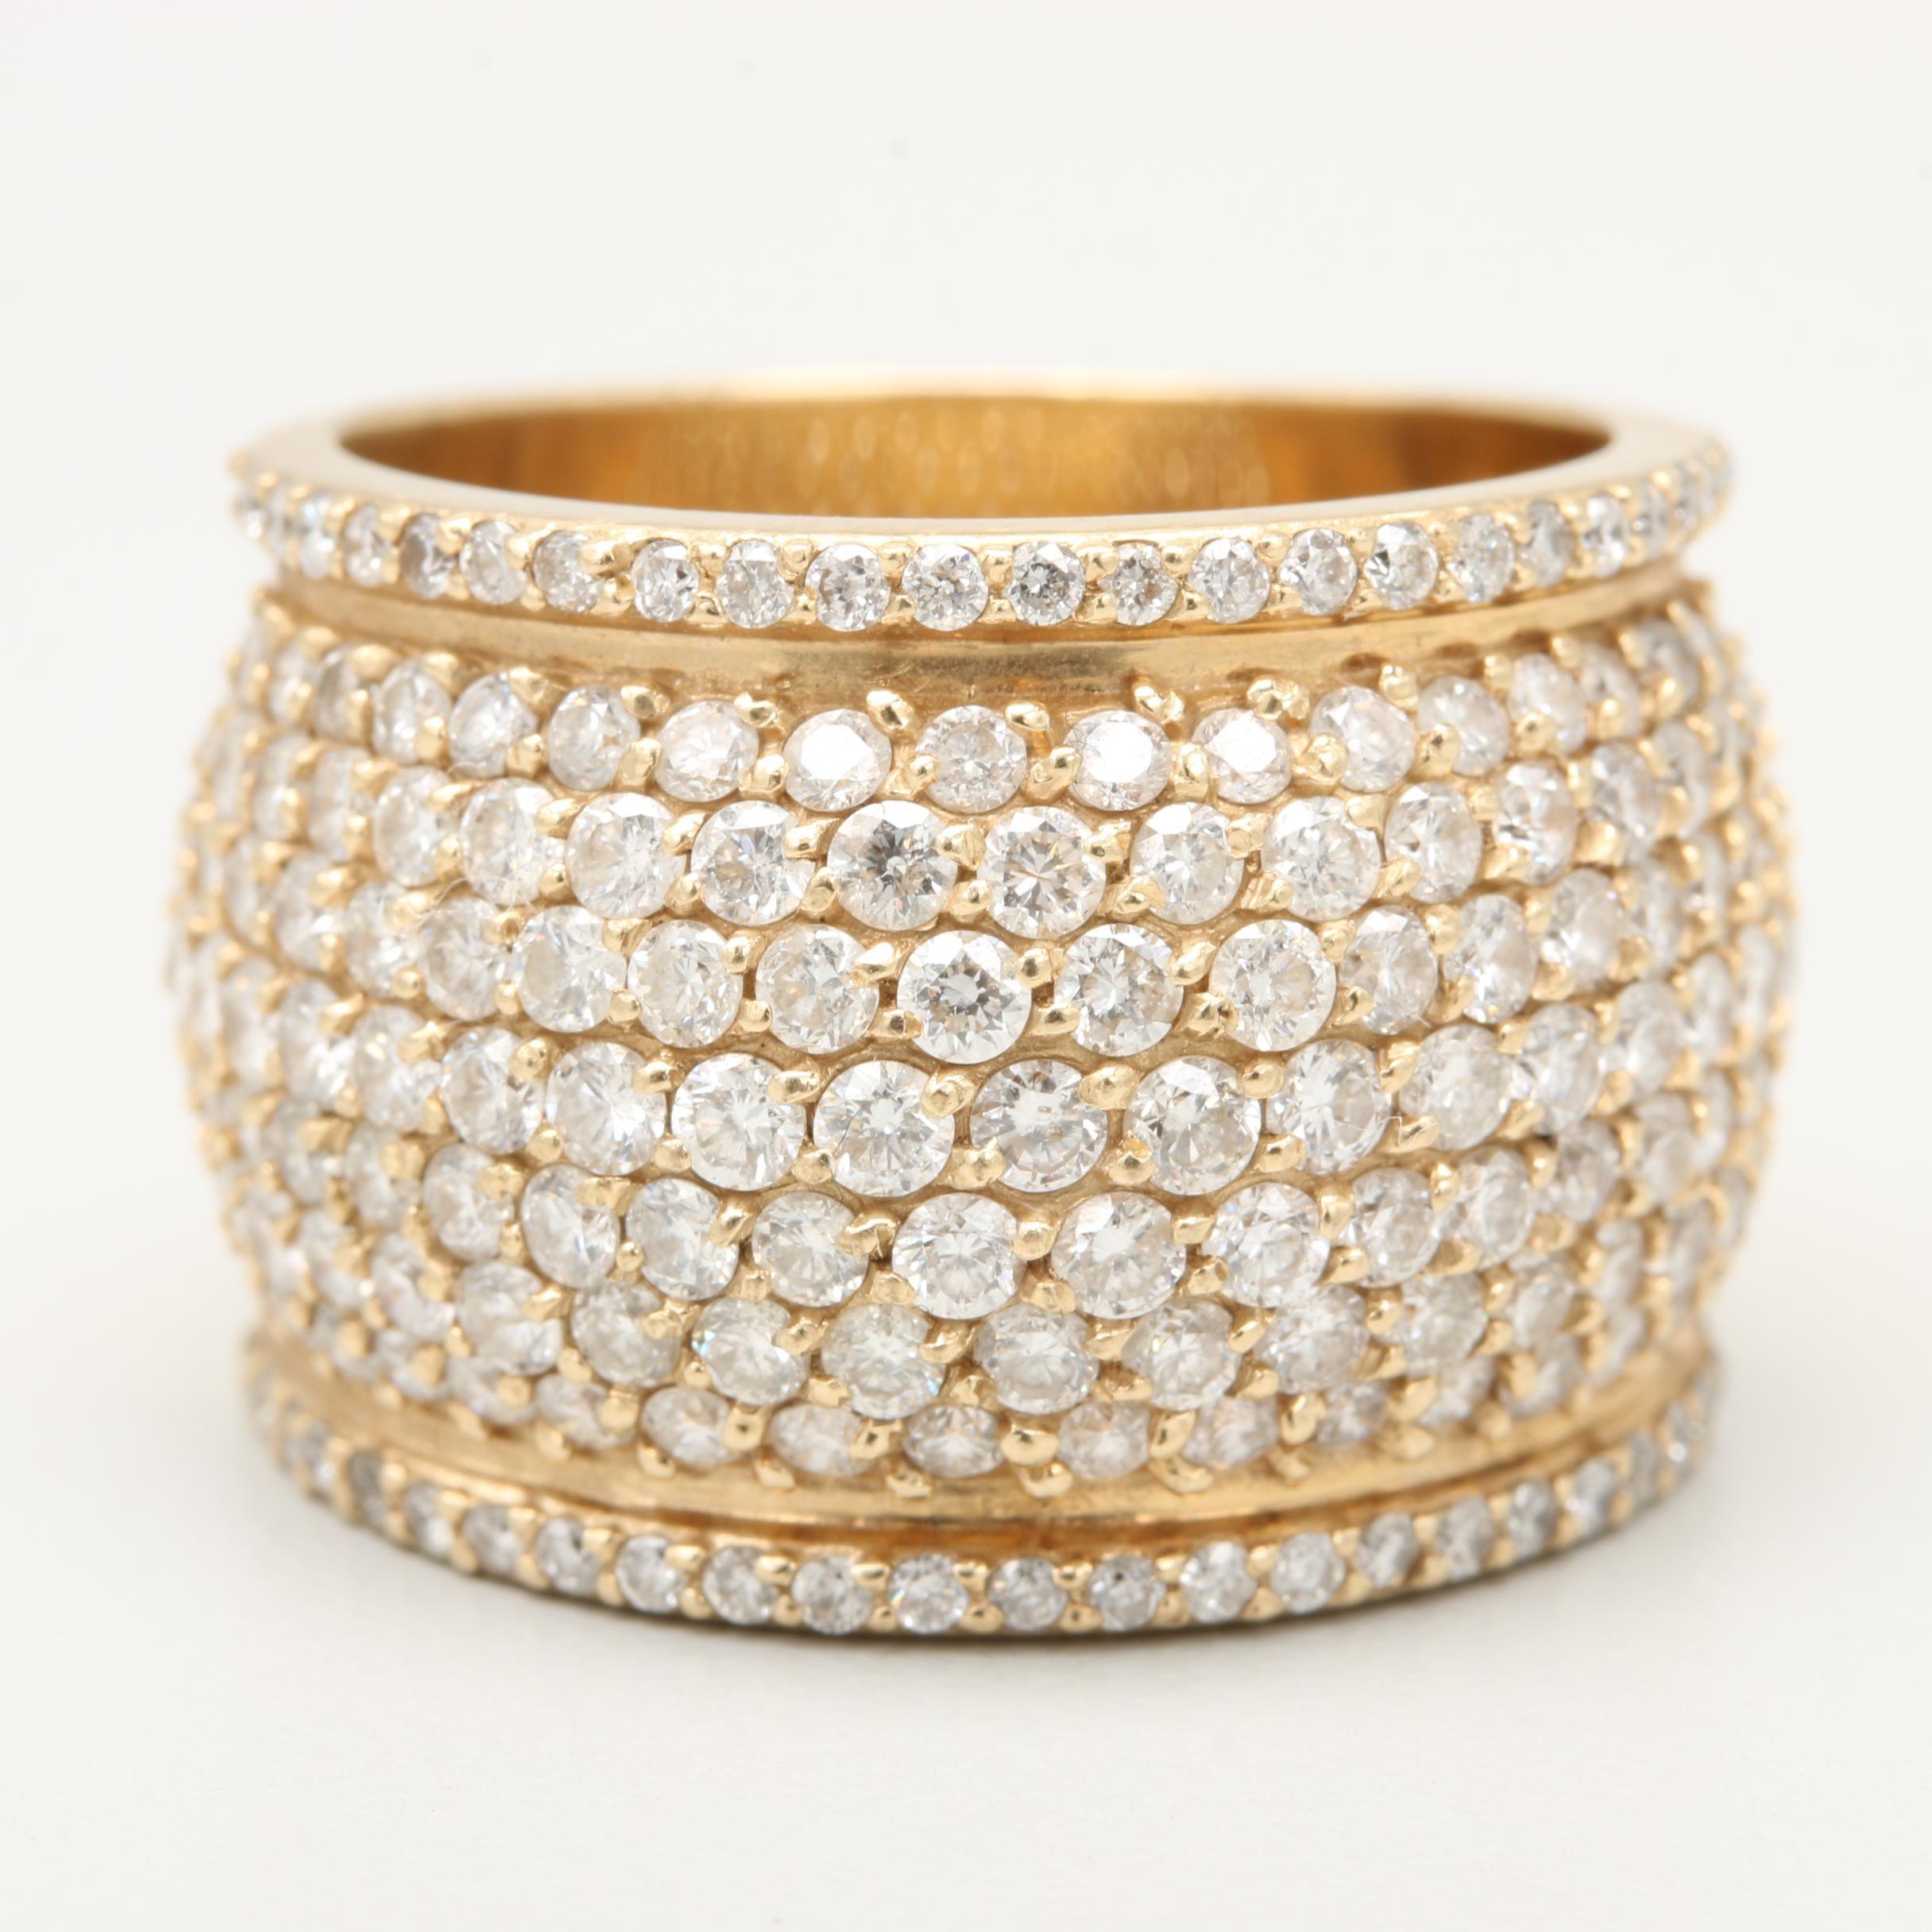 14K Yellow Gold 3.00 CTW Diamond Ring